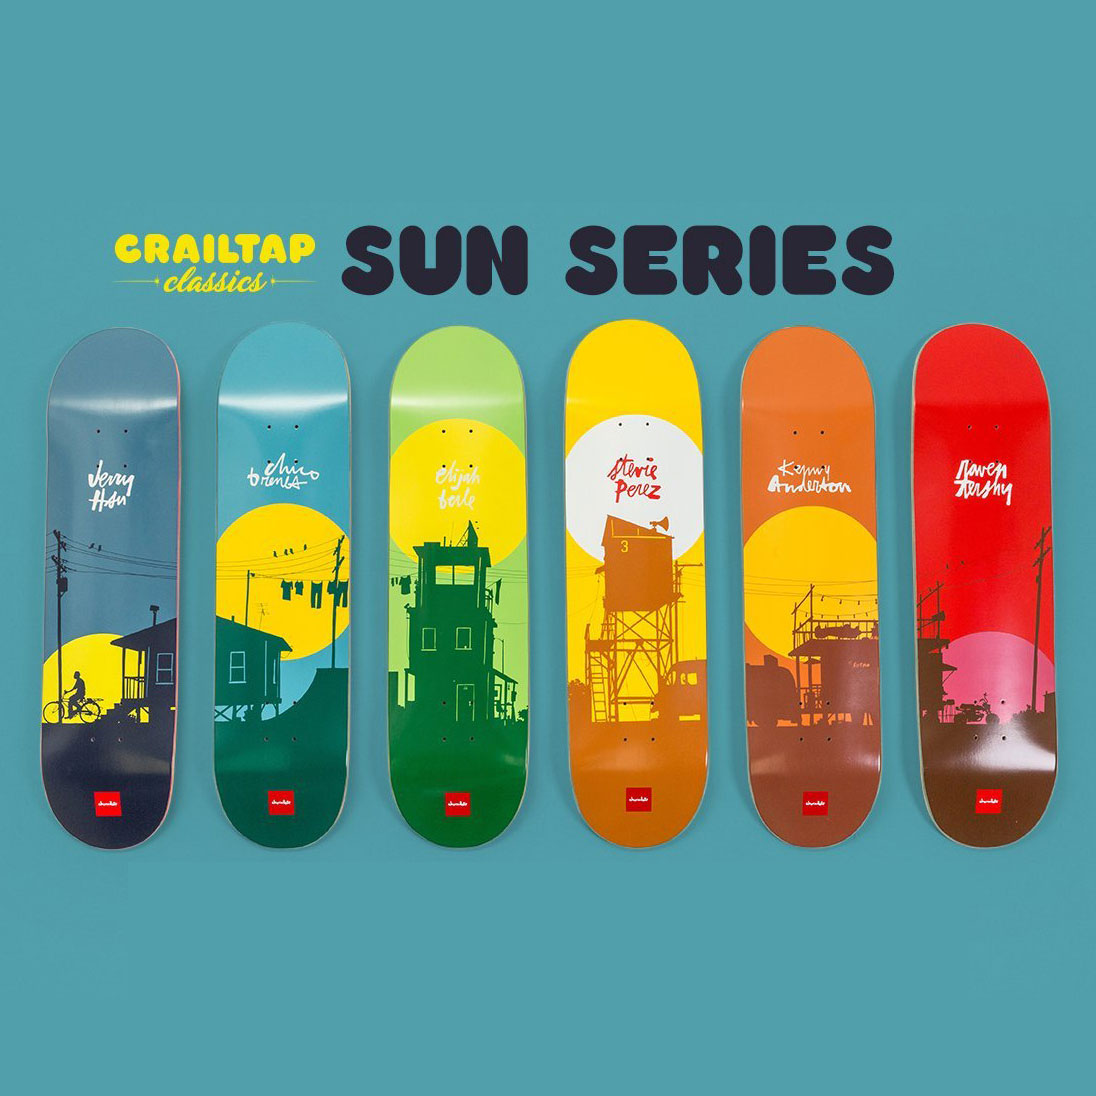 CHOCOLATE The Sun Series by Evan Hecox